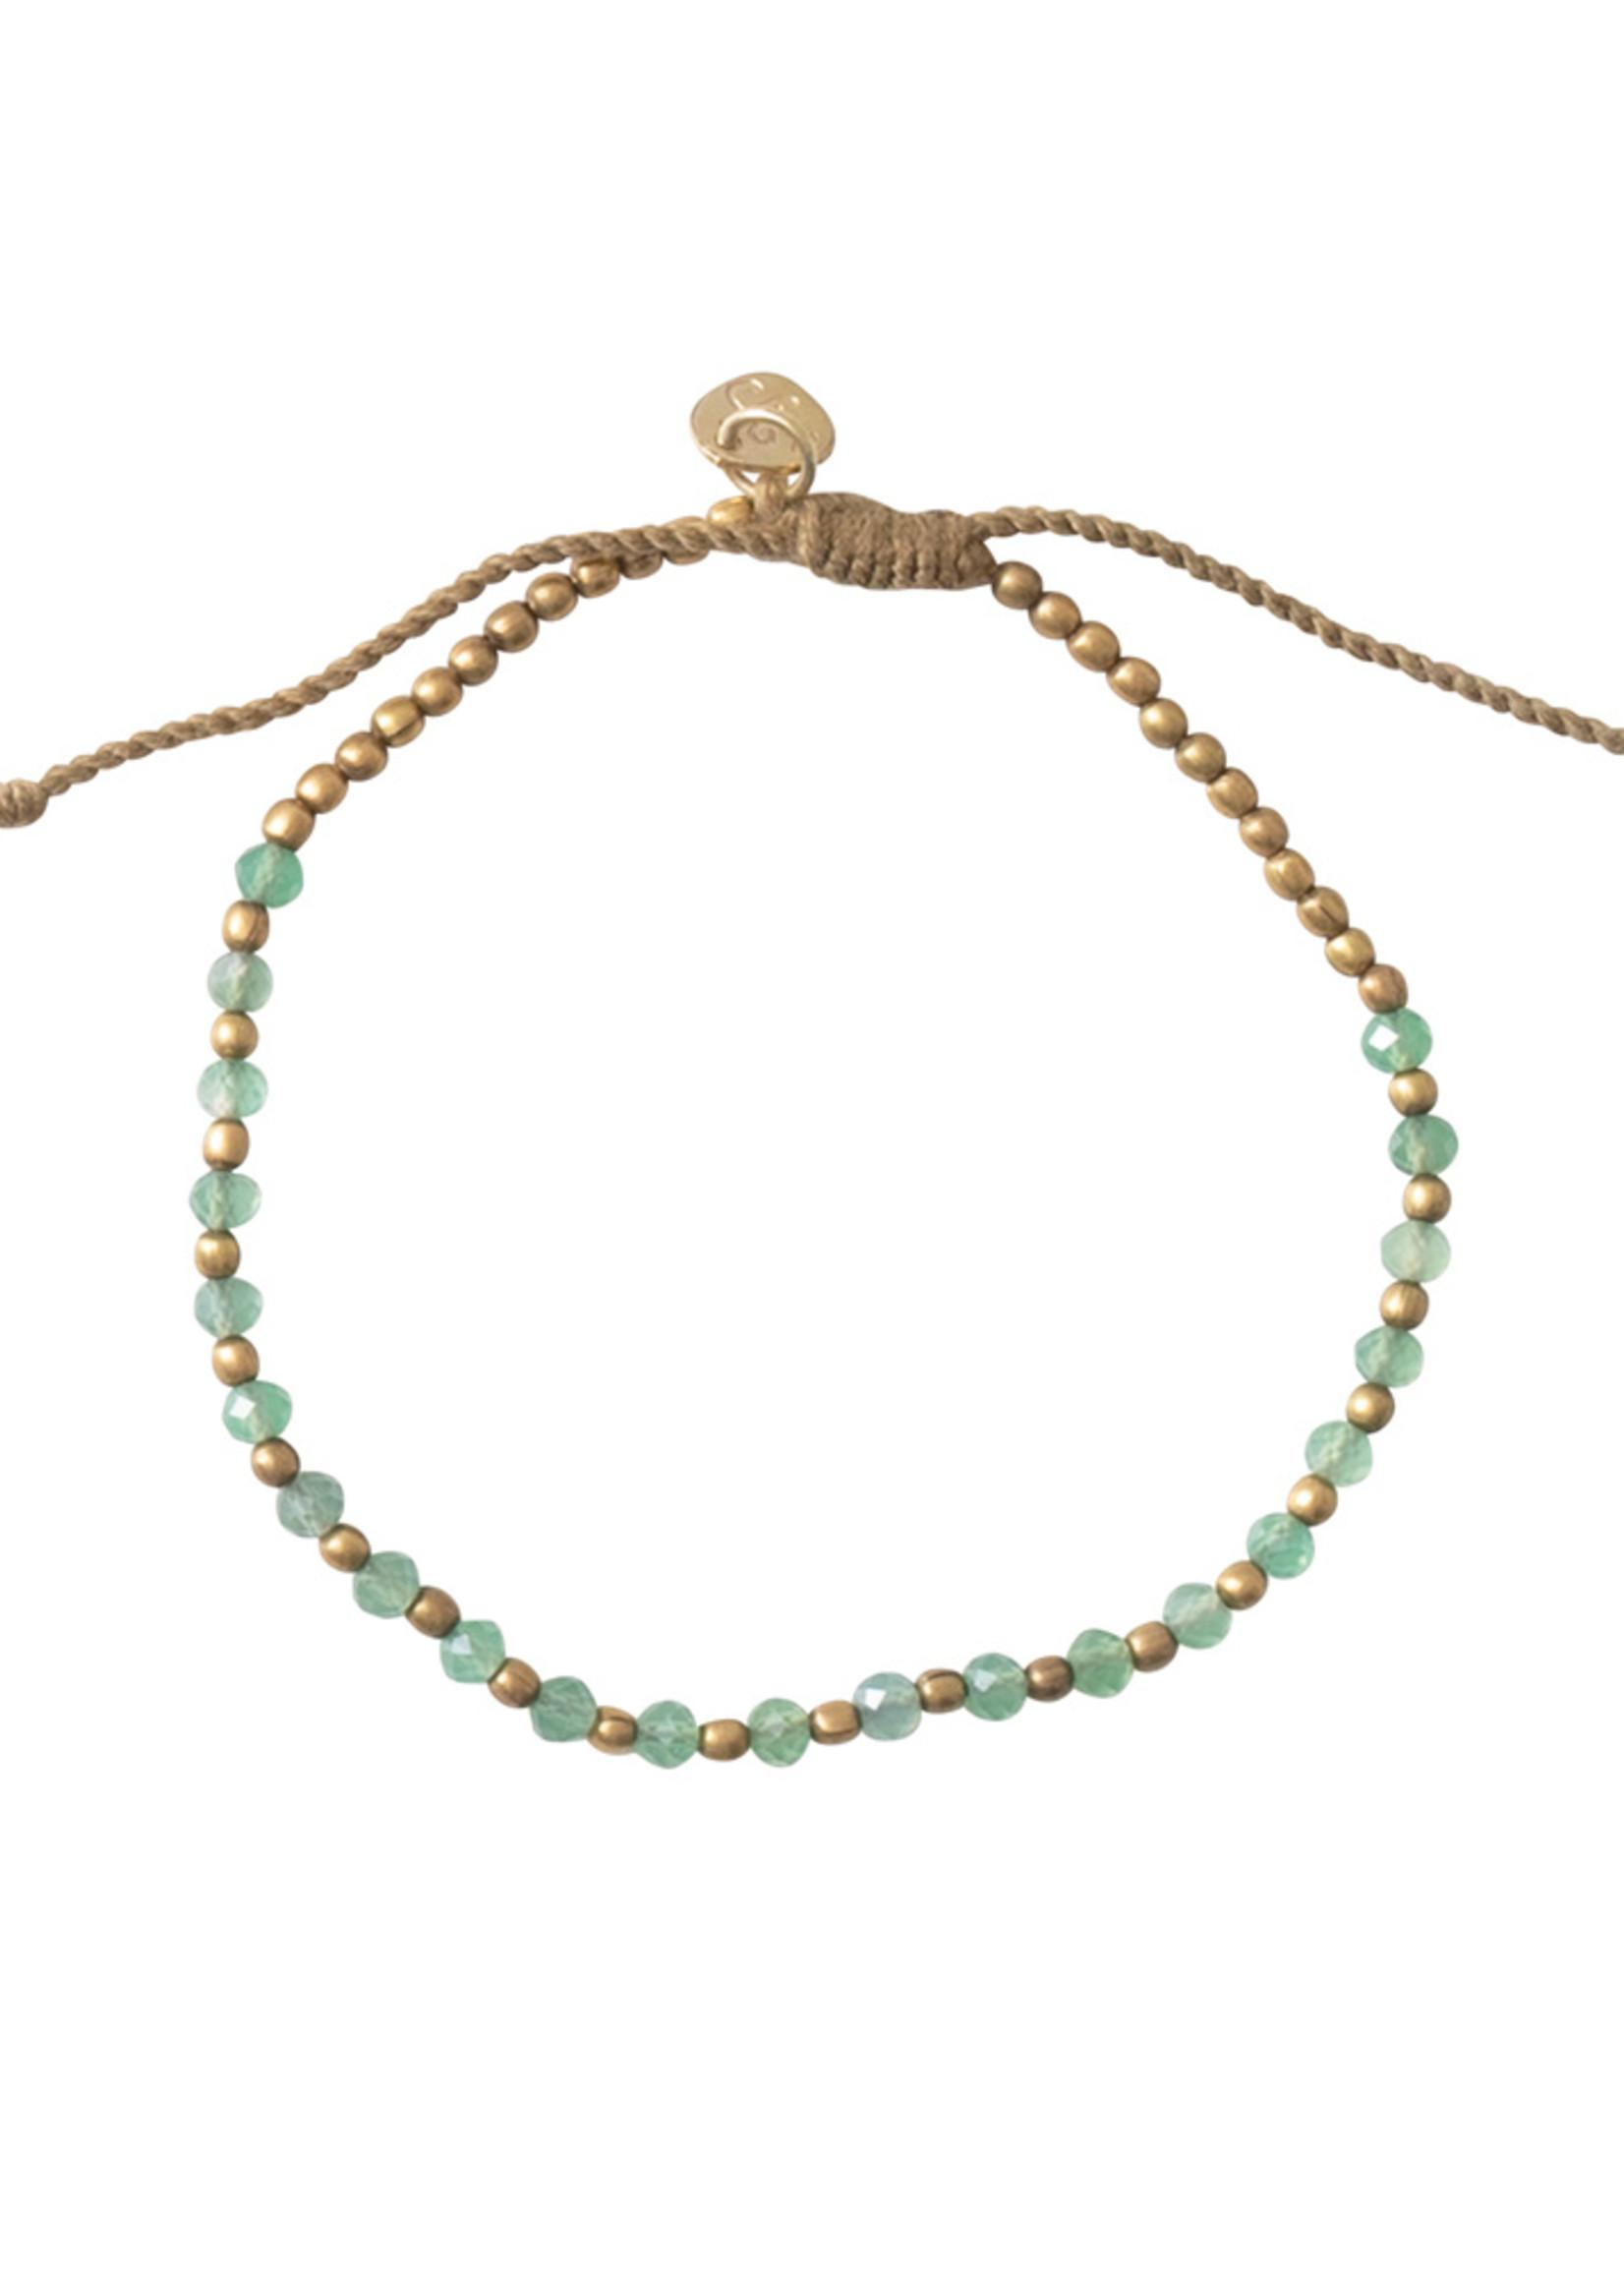 A Beautiful Story Beautiful Aventurine Gold Bracelet Goud